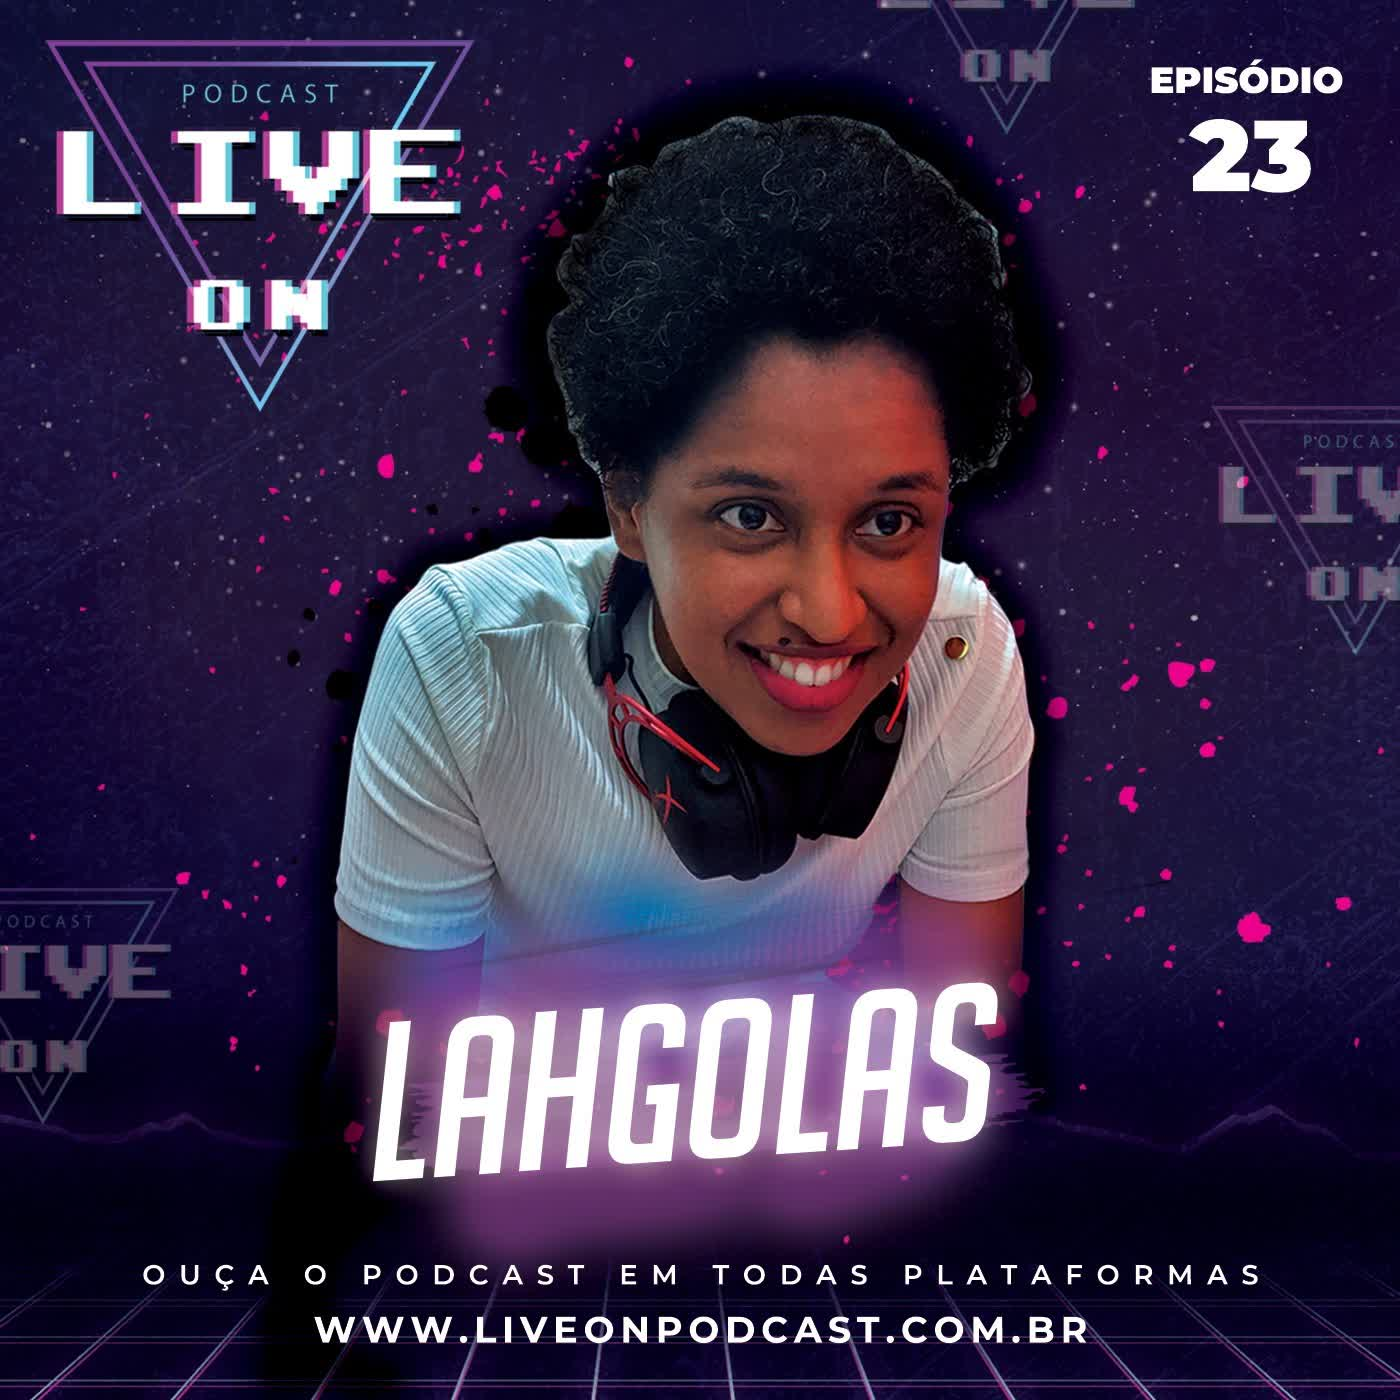 Live On Podcast - Convidada: Lahgolas - Episódio 23